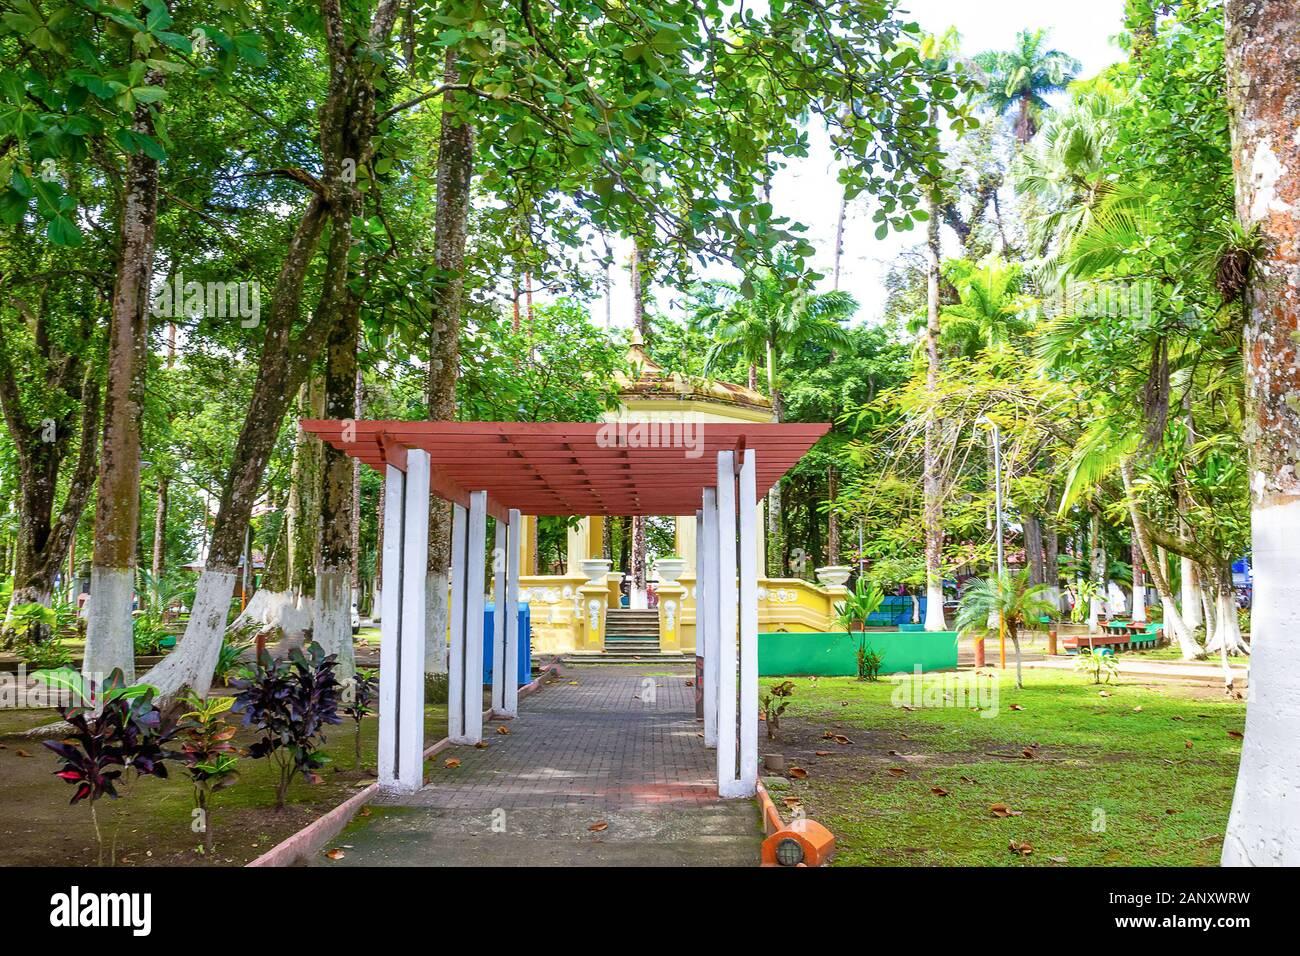 Parque Vargas City Park In Puerto Limon Costa Rica Stock Photo Alamy